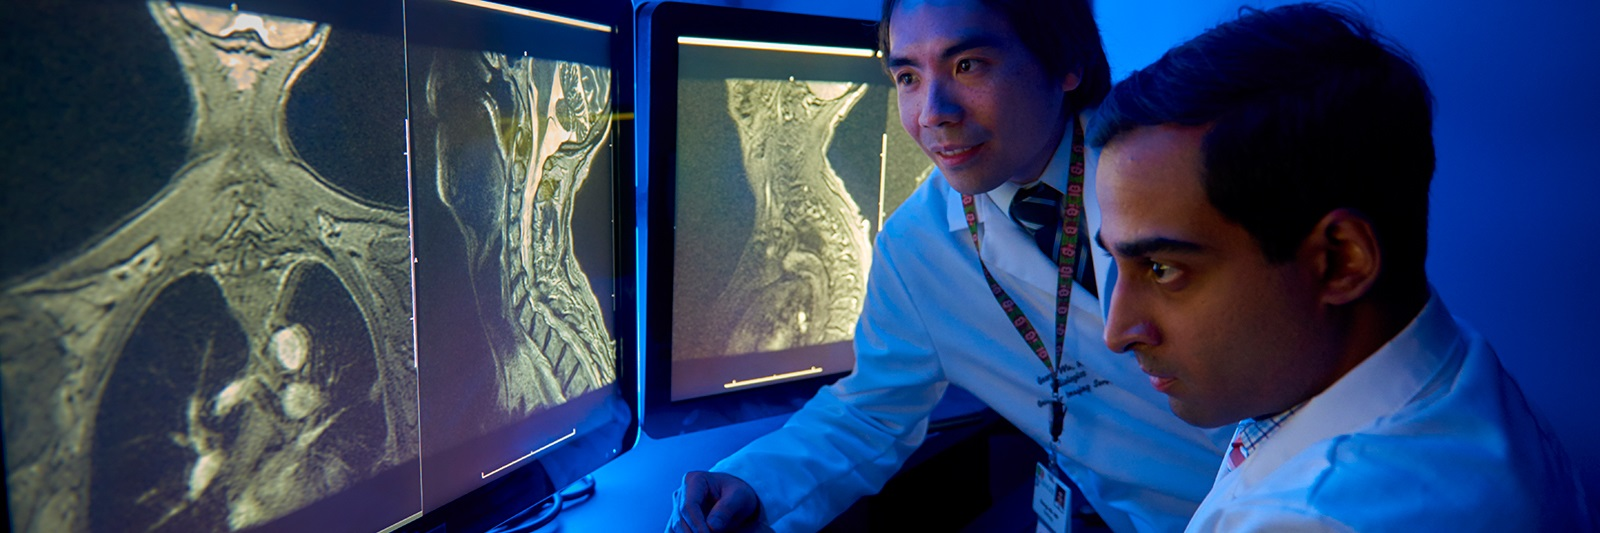 Diagnostic Radiology Residency